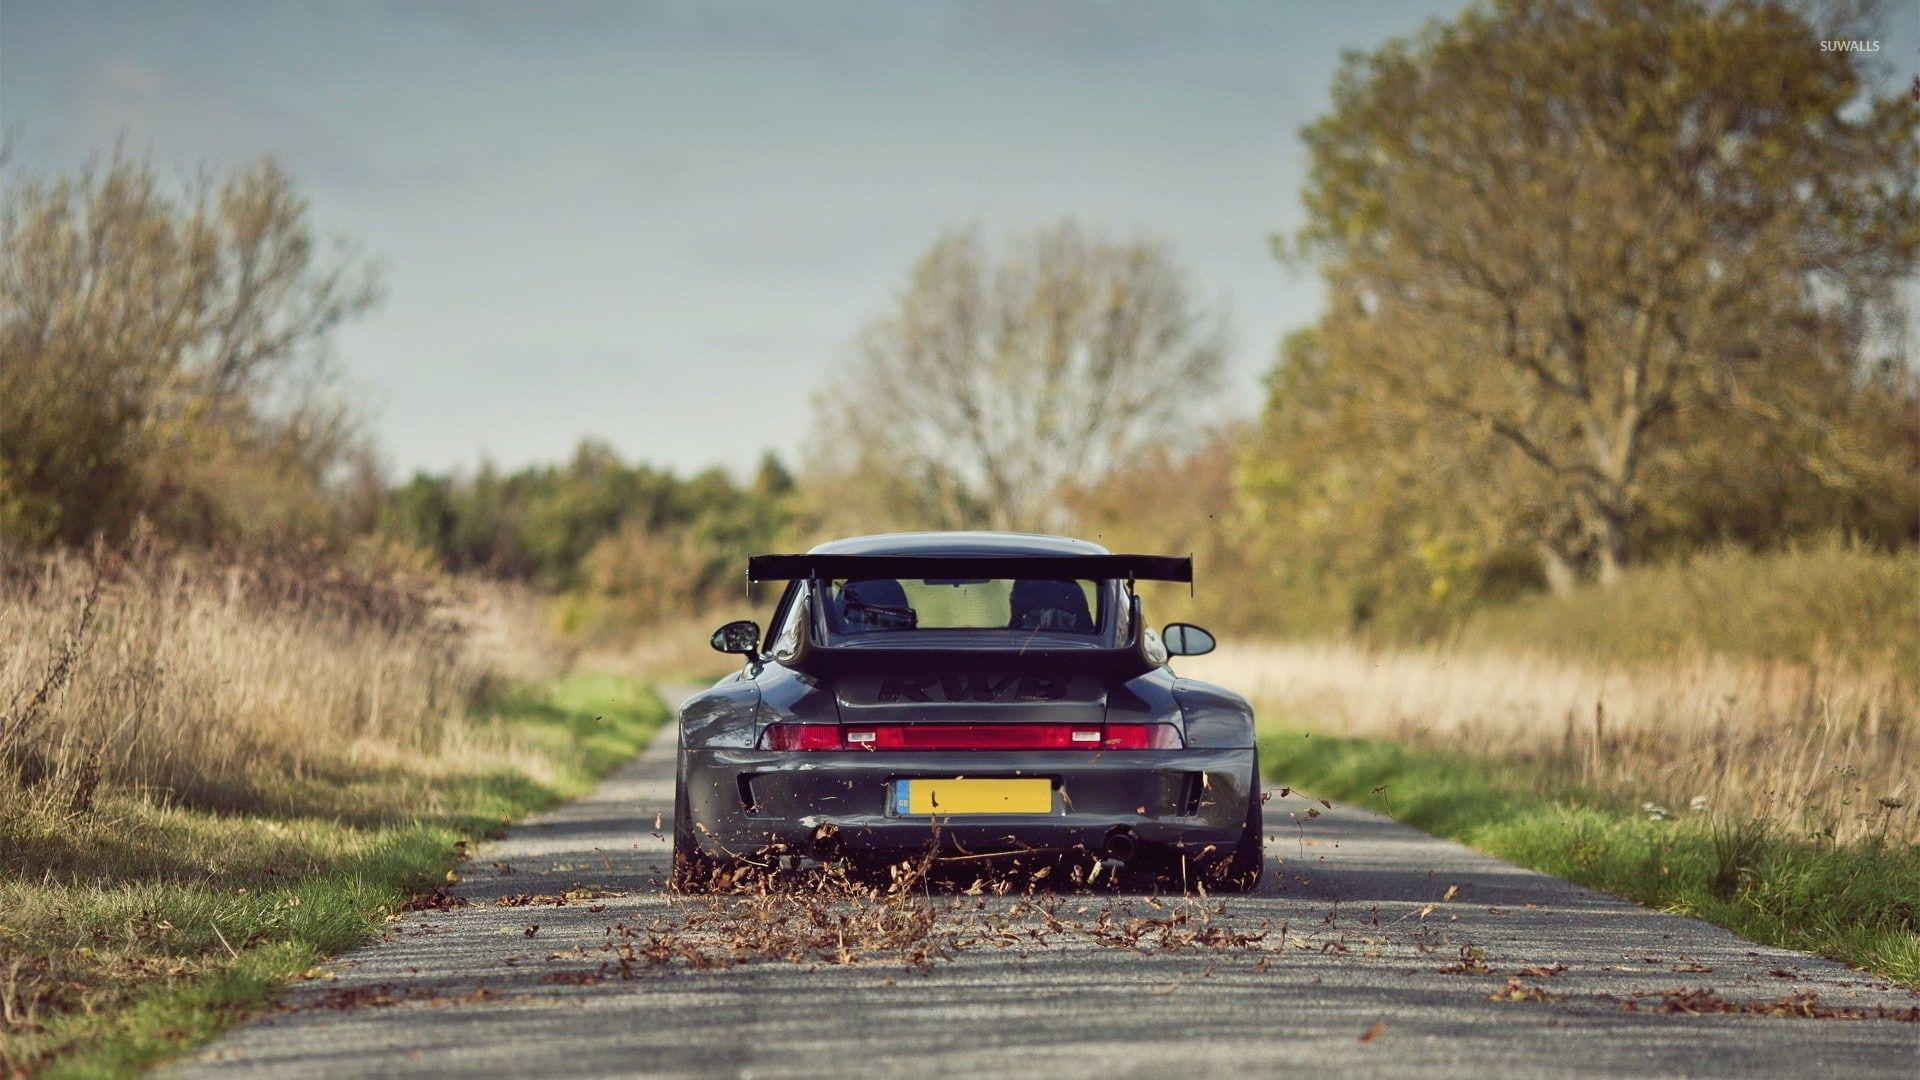 Porsche 911 Rwb Car 1080p Wallpaper Hdwallpaper Desktop Auto Carros